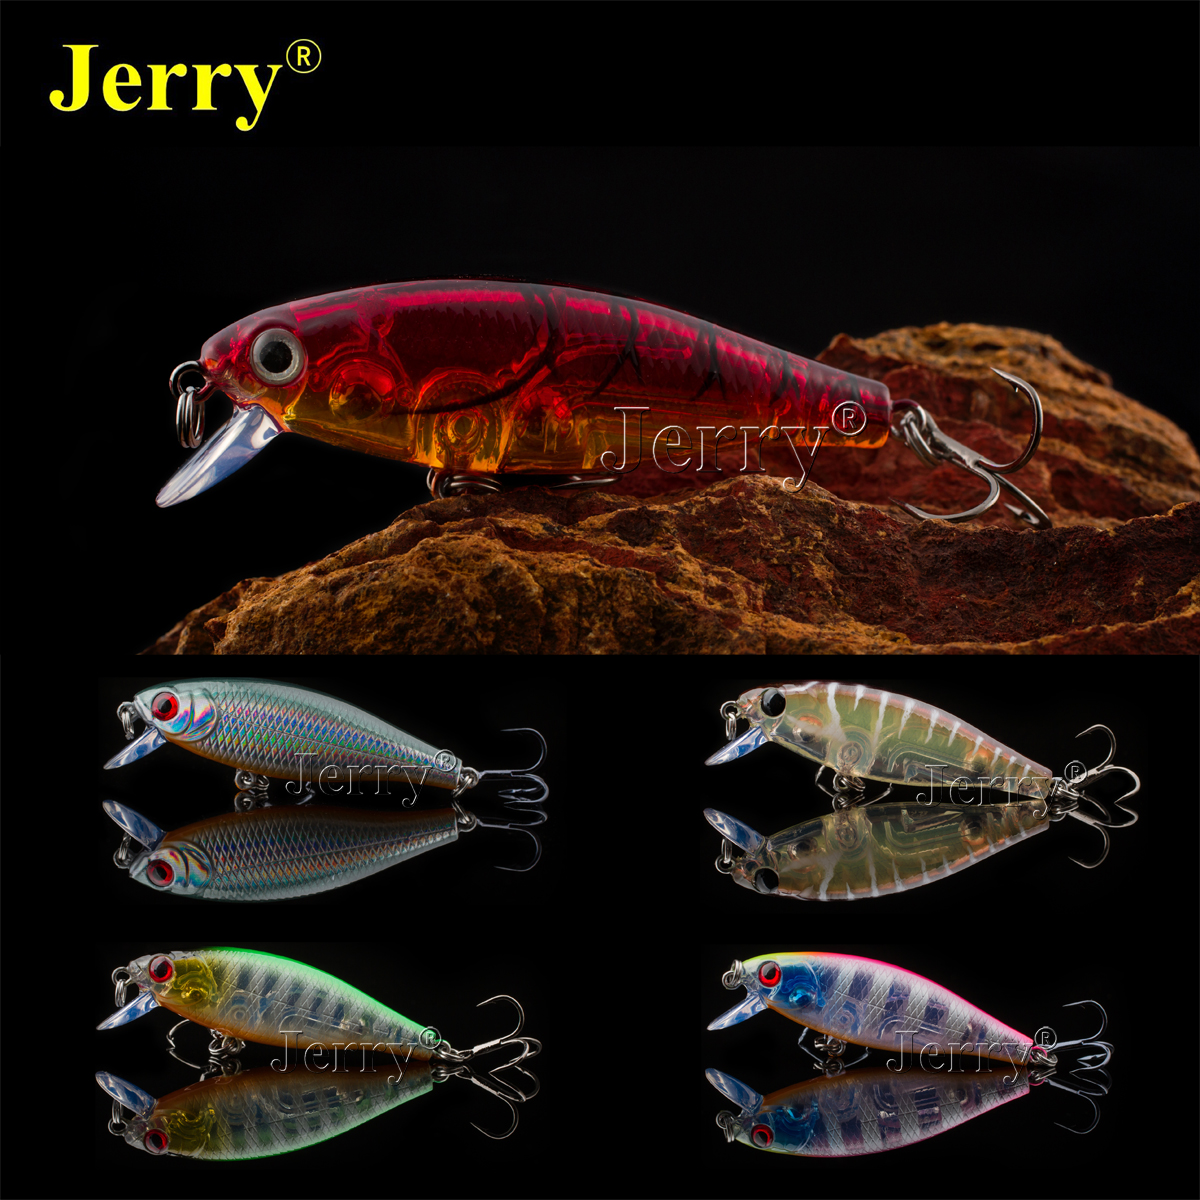 Jerry 1pc Japan crank bait minnow 5cm/2in 4.8g BKK hook wobbler slow sinking plug crankbait fishing hard lure